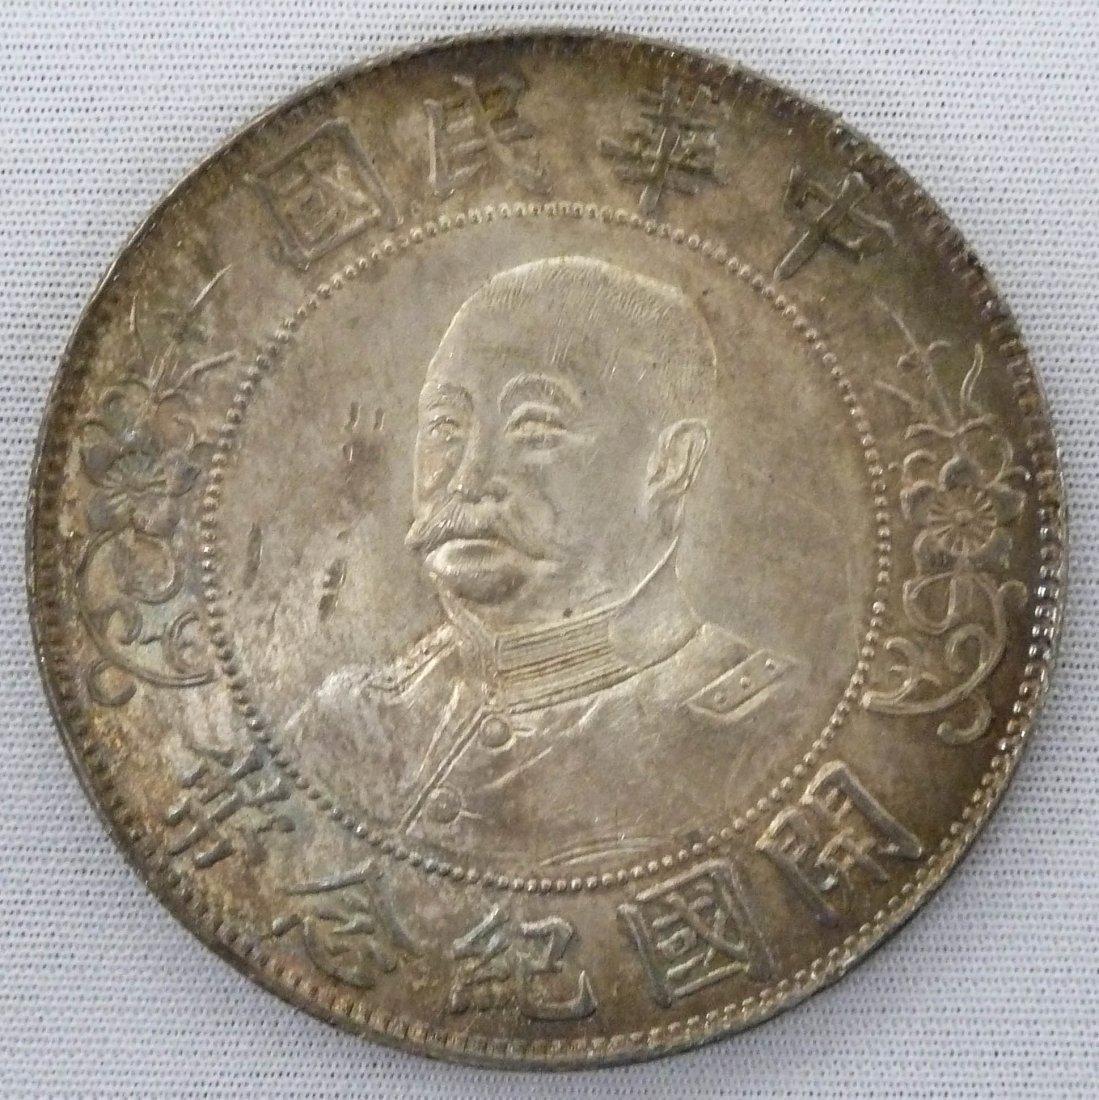 1912 Chinese Li Yuan-Hung Republic Silver Dollar (A).